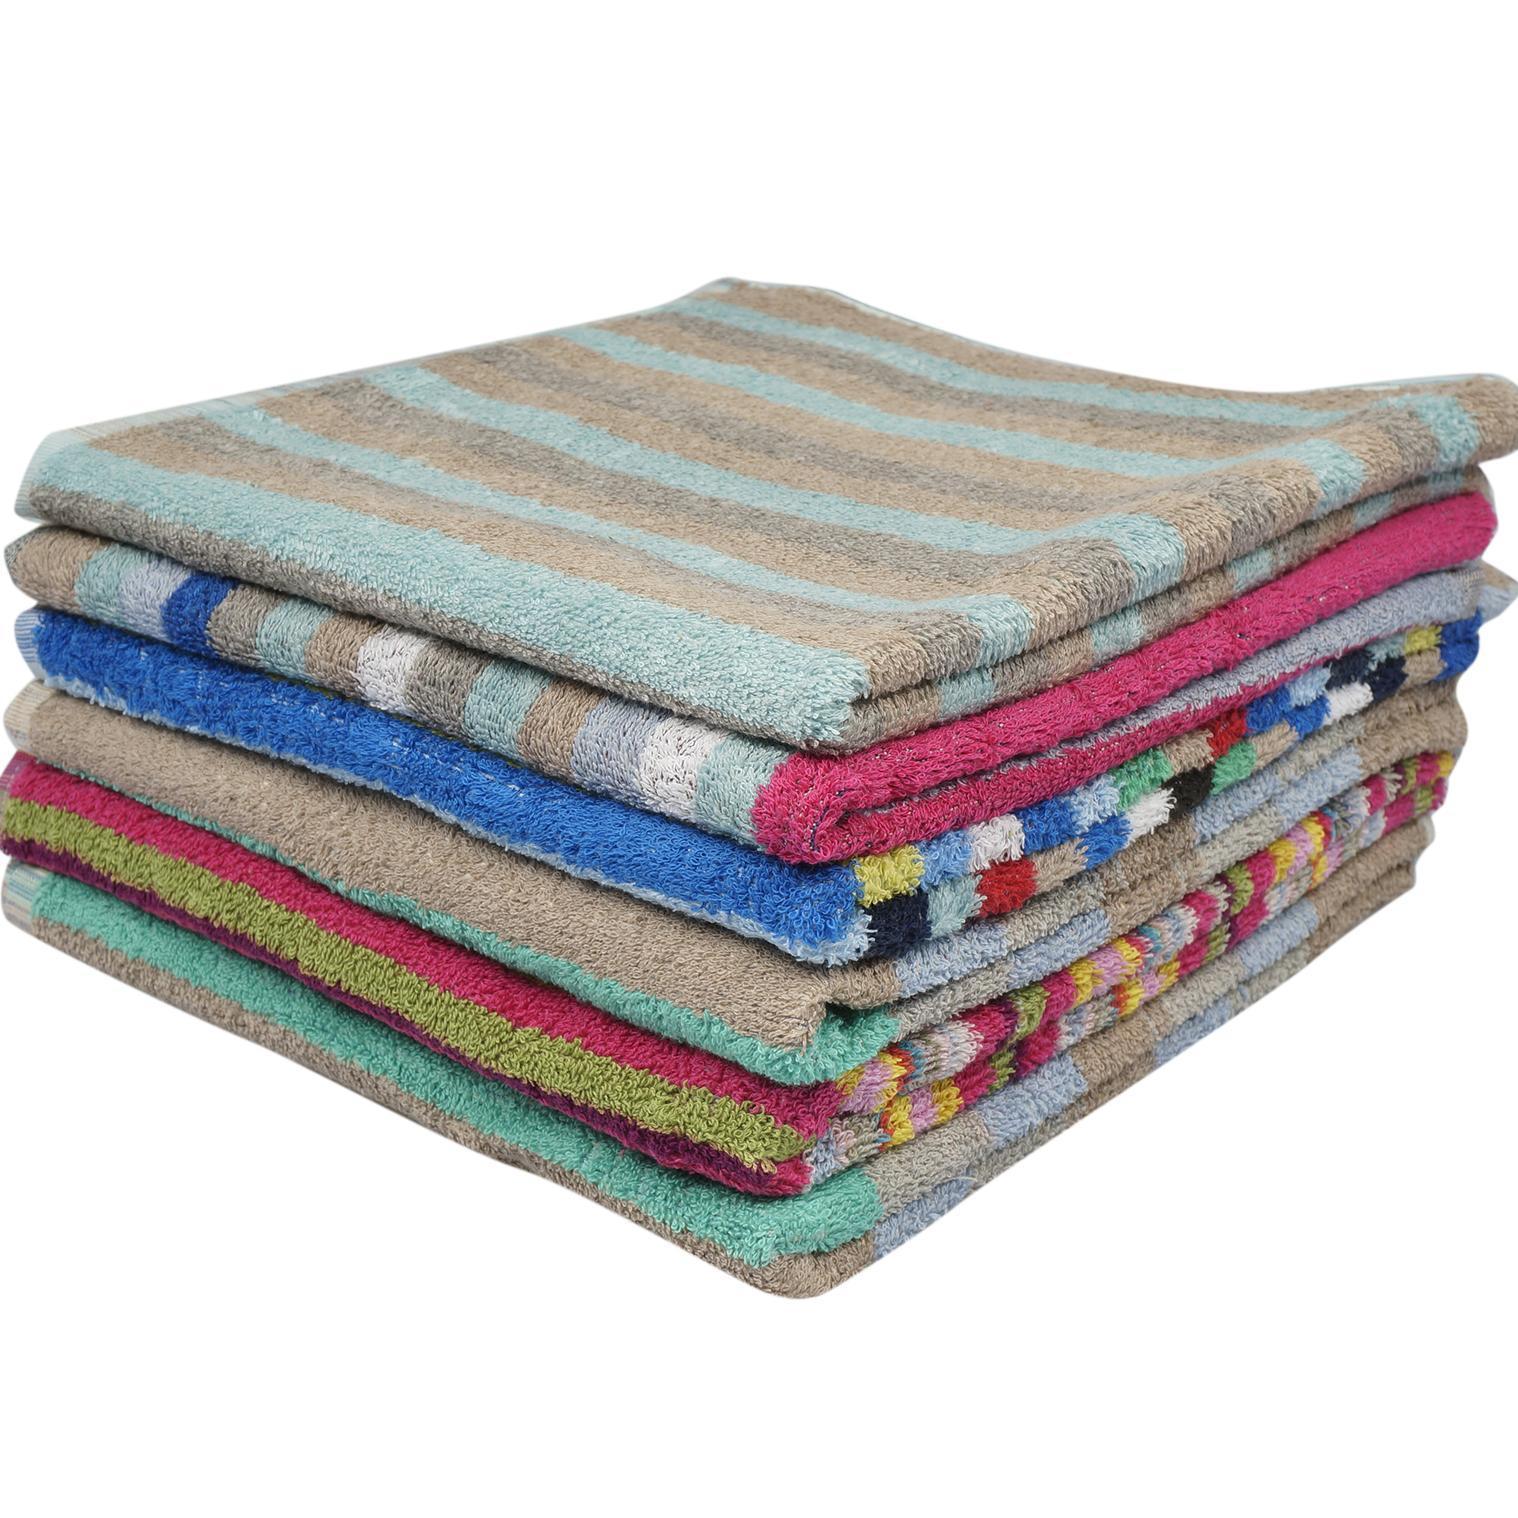 Wholesale Striped Bath Towel (SKU 2332468) DollarDays